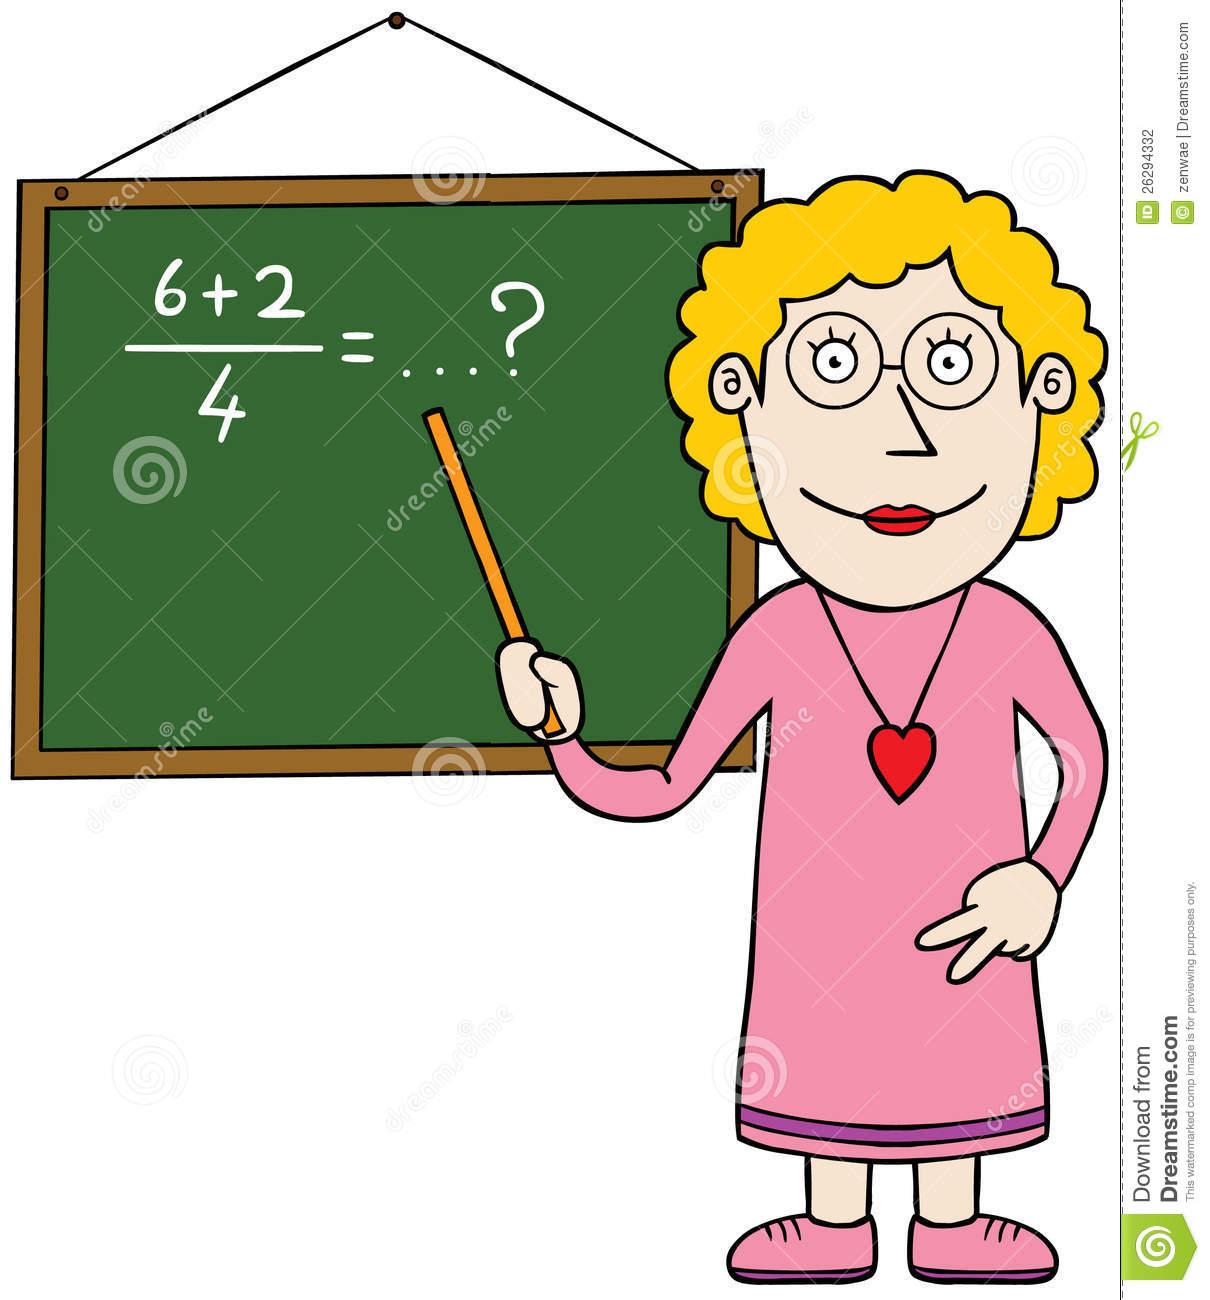 a teacher is teaching math. | clipart panda - free clipart images